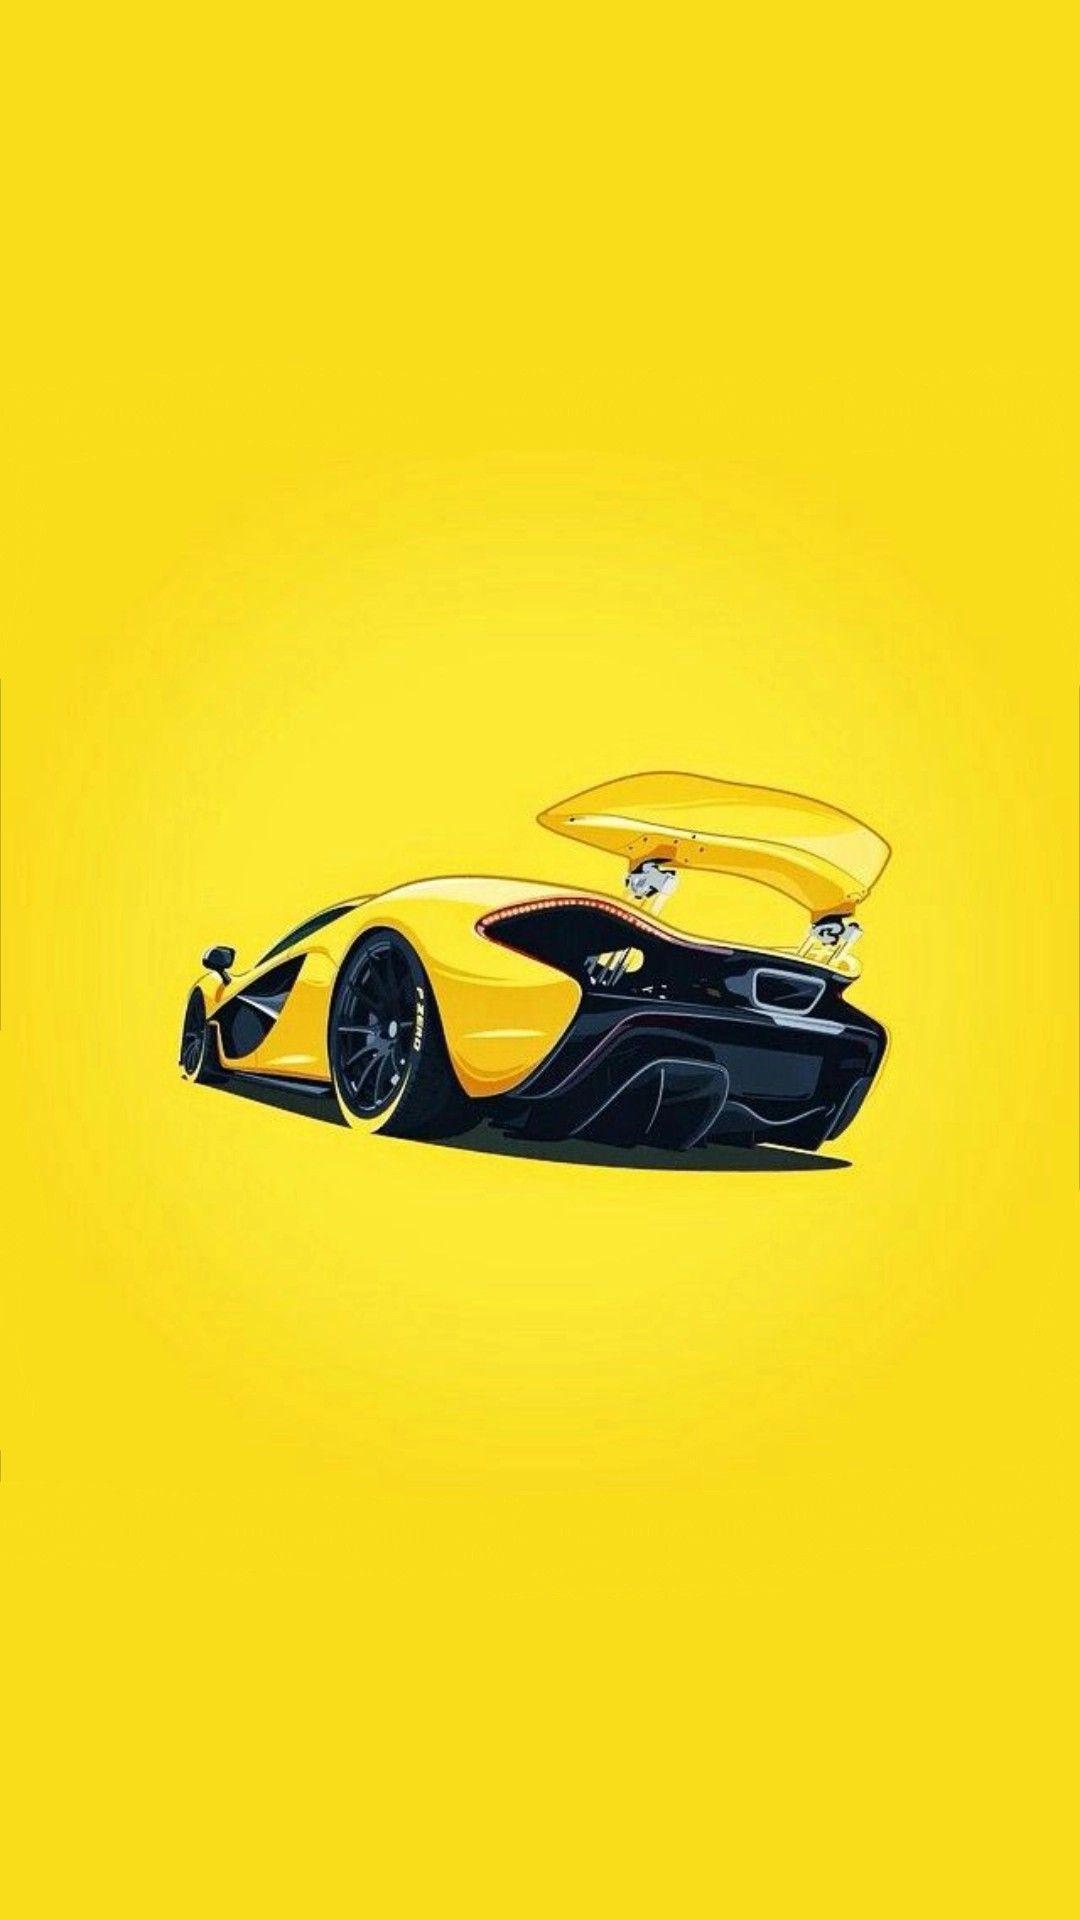 Pin By Fatih Burak Ceylan On Rides Car Artwork Car Drawings Car Iphone Wallpaper